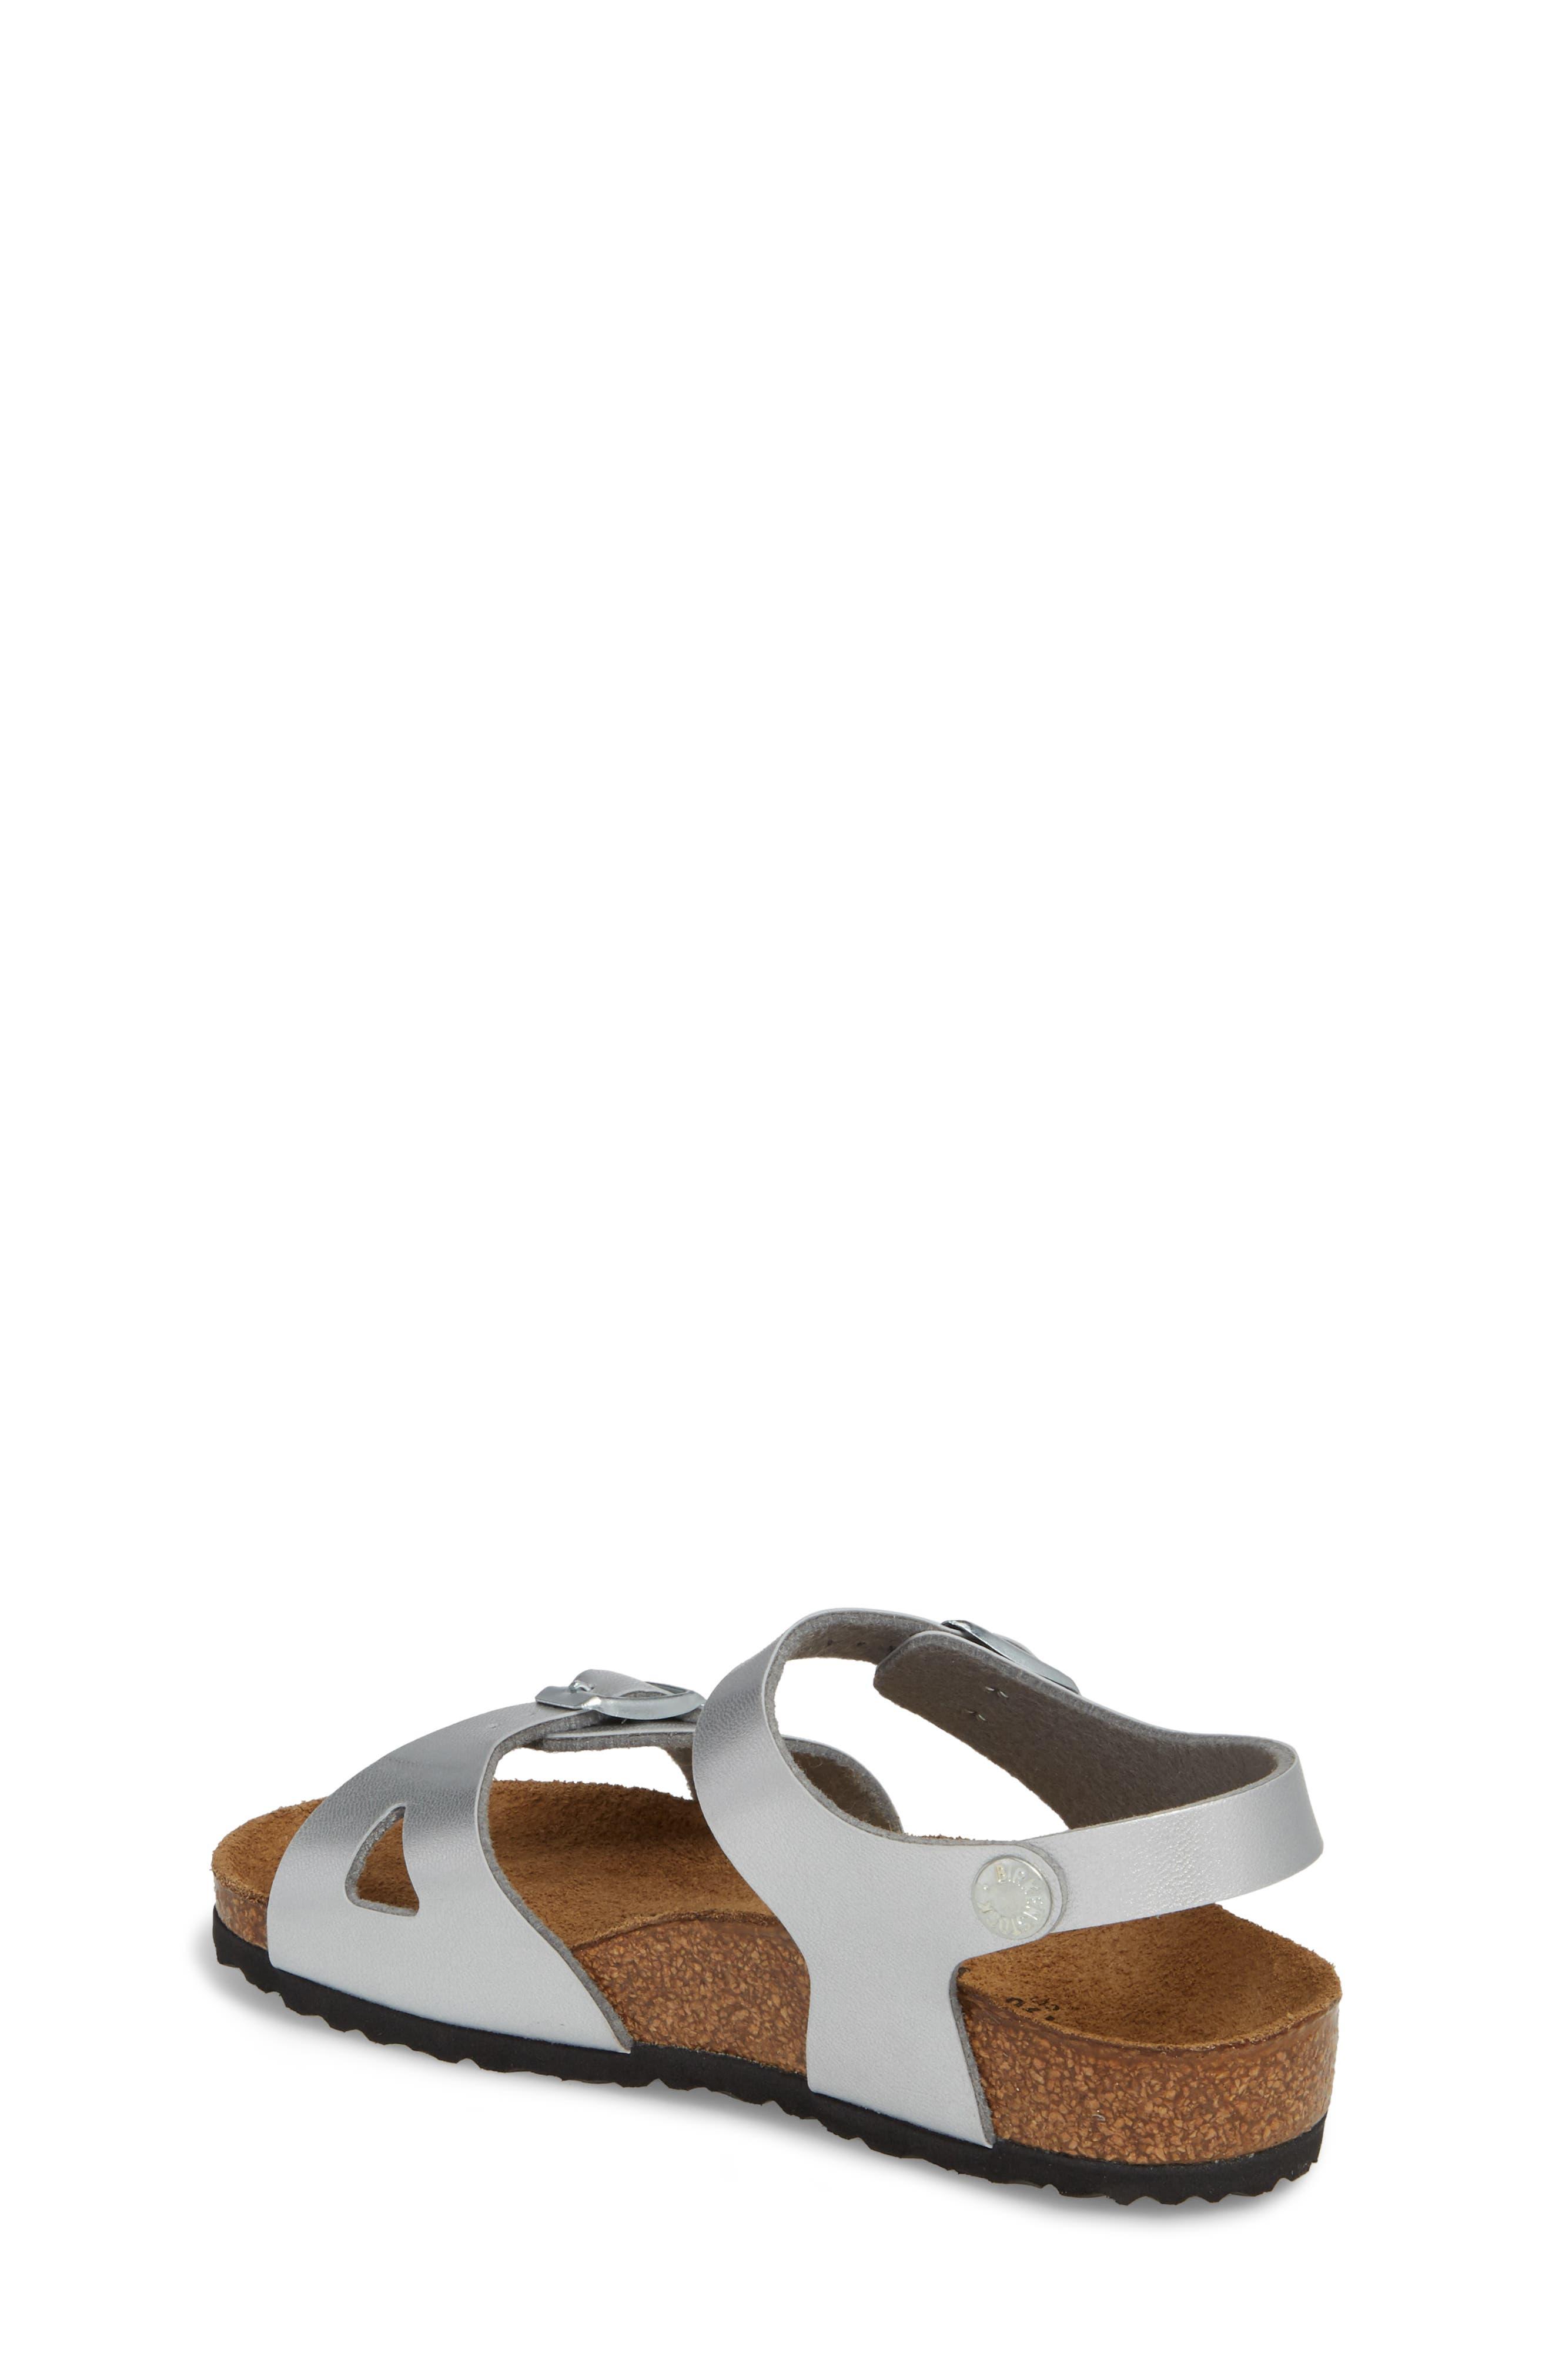 Rio Metallic Sandal,                             Alternate thumbnail 2, color,                             Silver